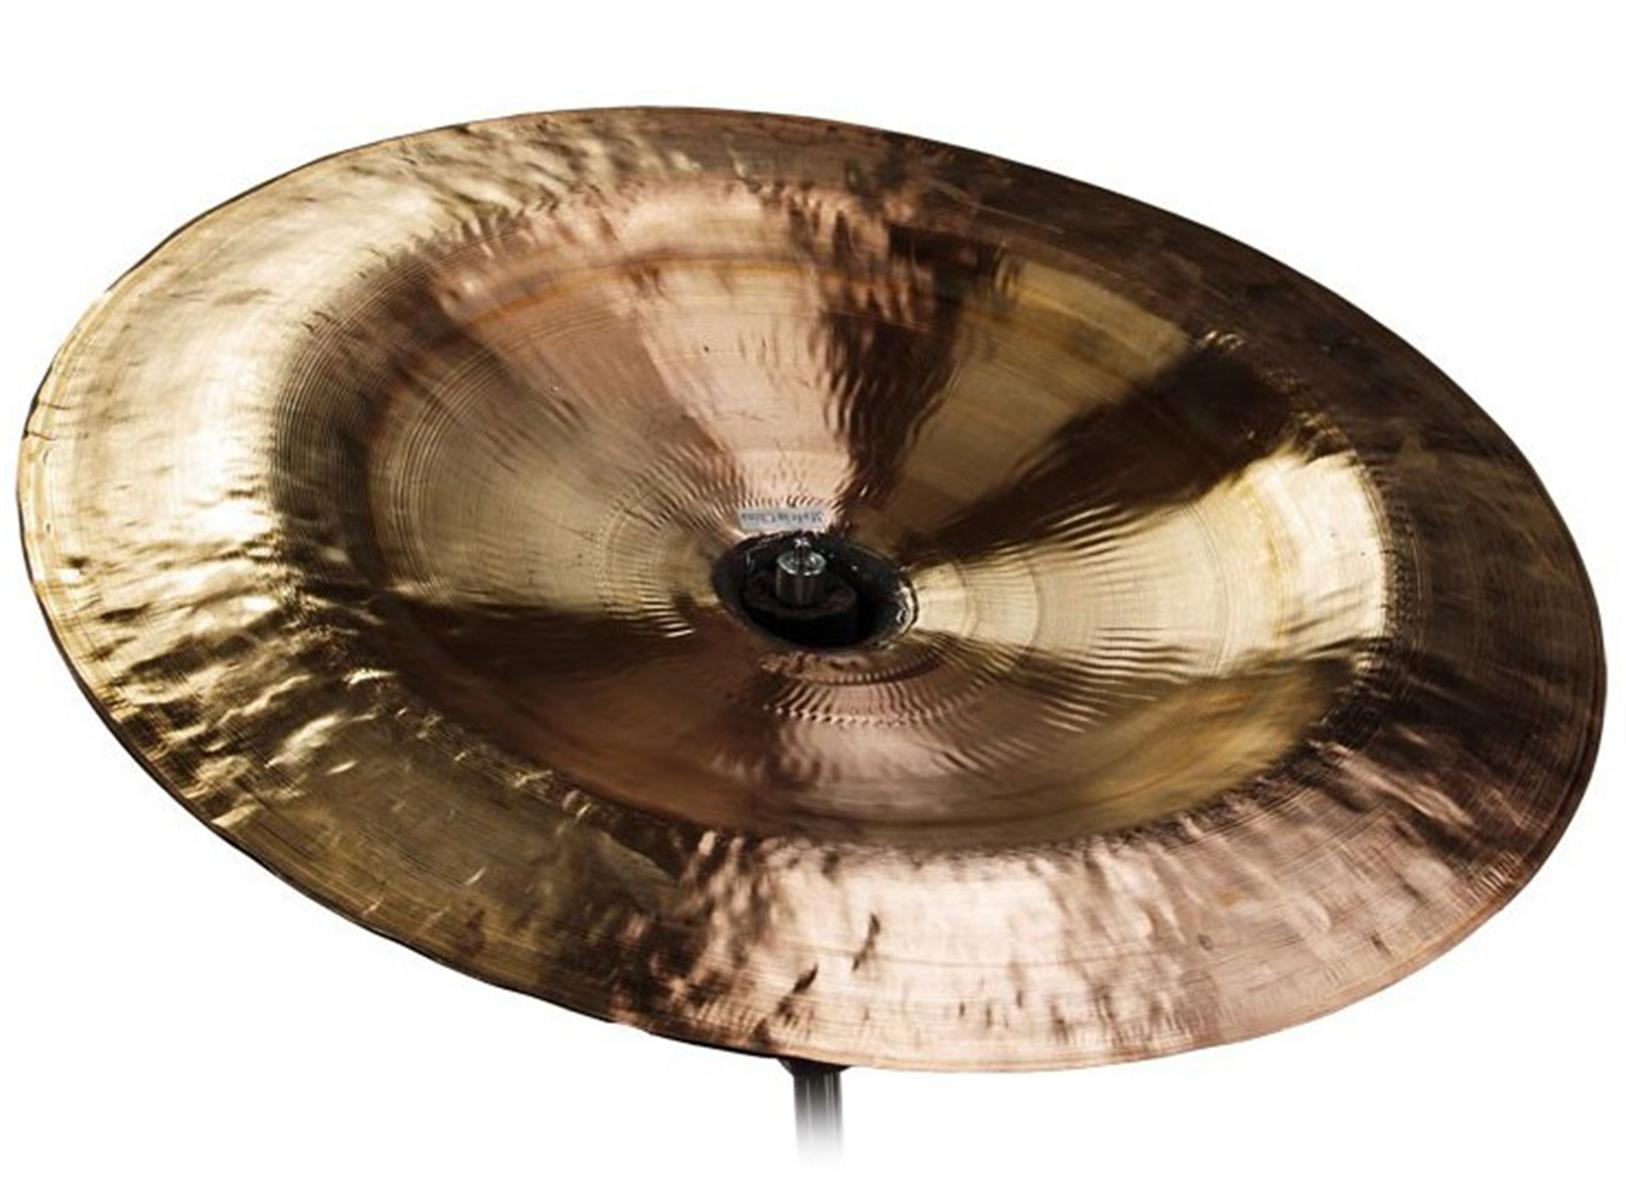 wuhan china cymbal 16 wu104 16 660181141970 ebay. Black Bedroom Furniture Sets. Home Design Ideas